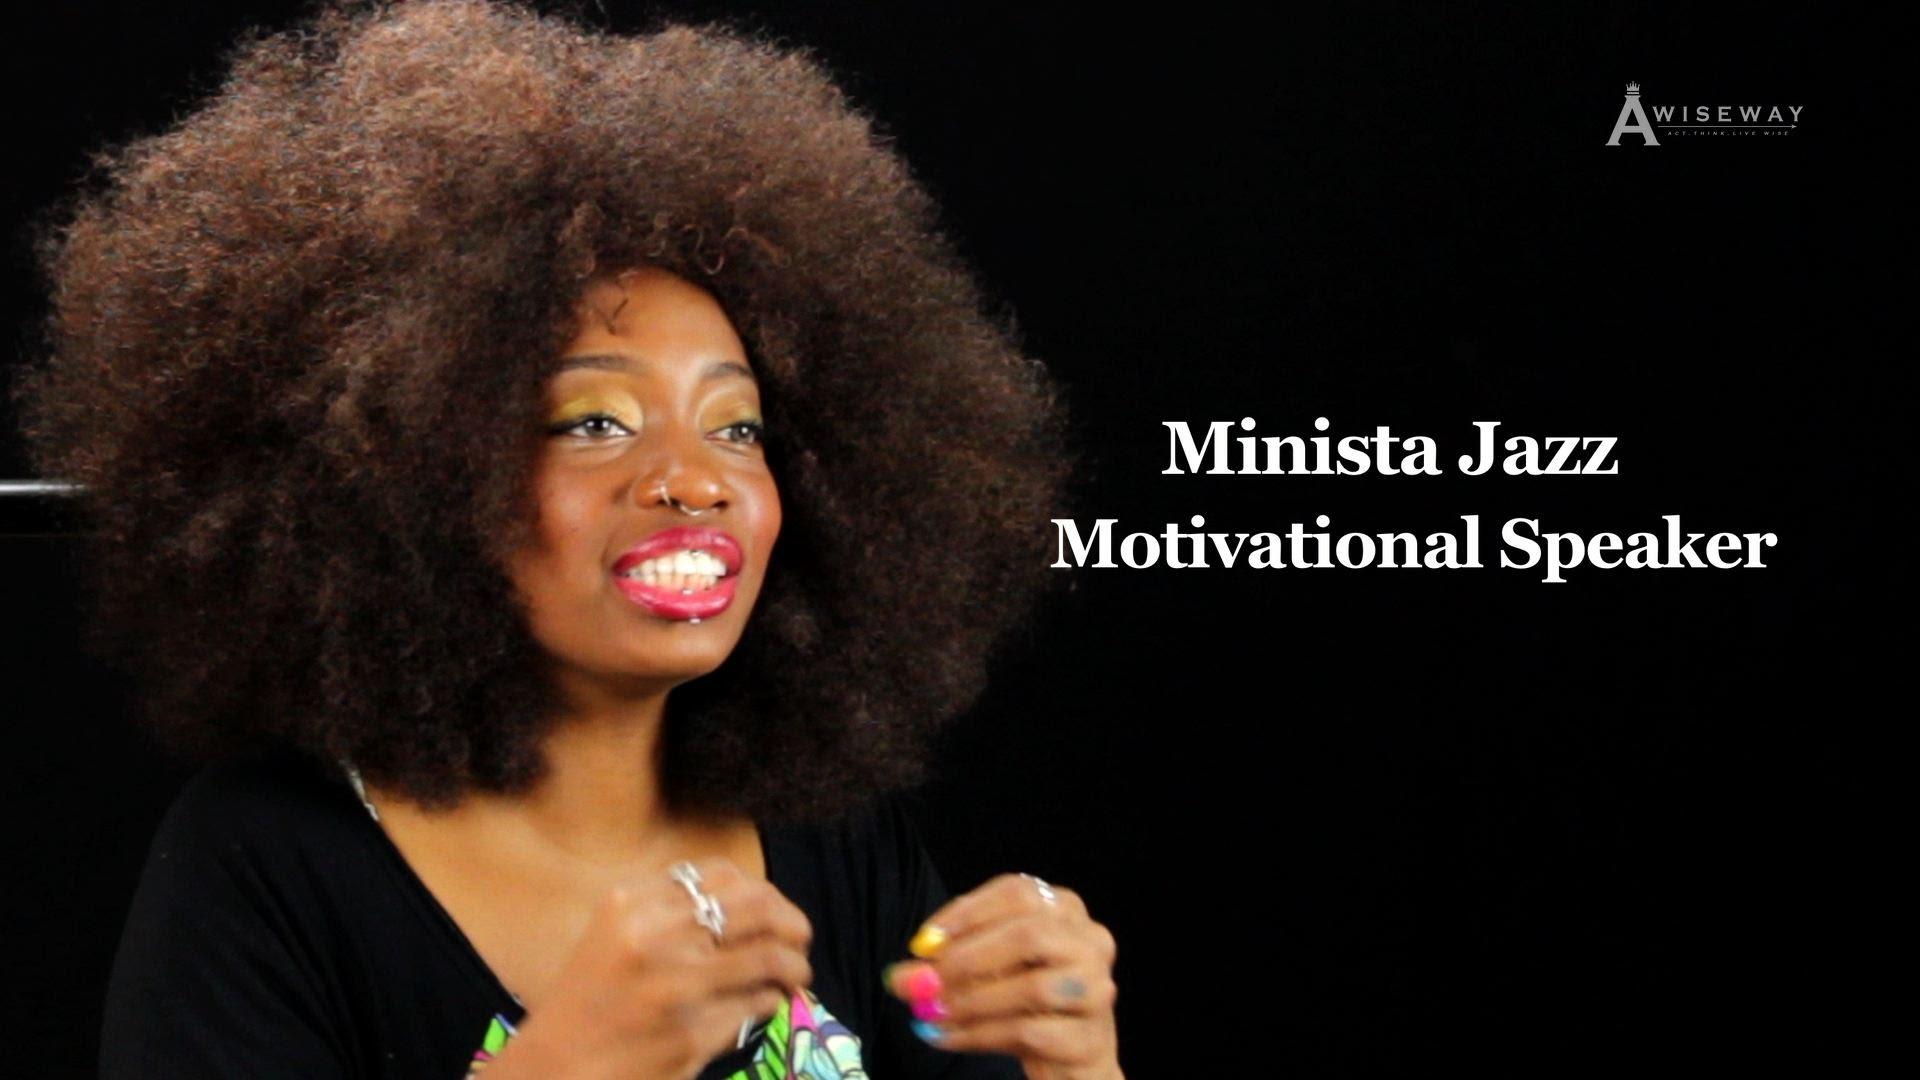 Motivational Speaker Shares the Misconception of Fame